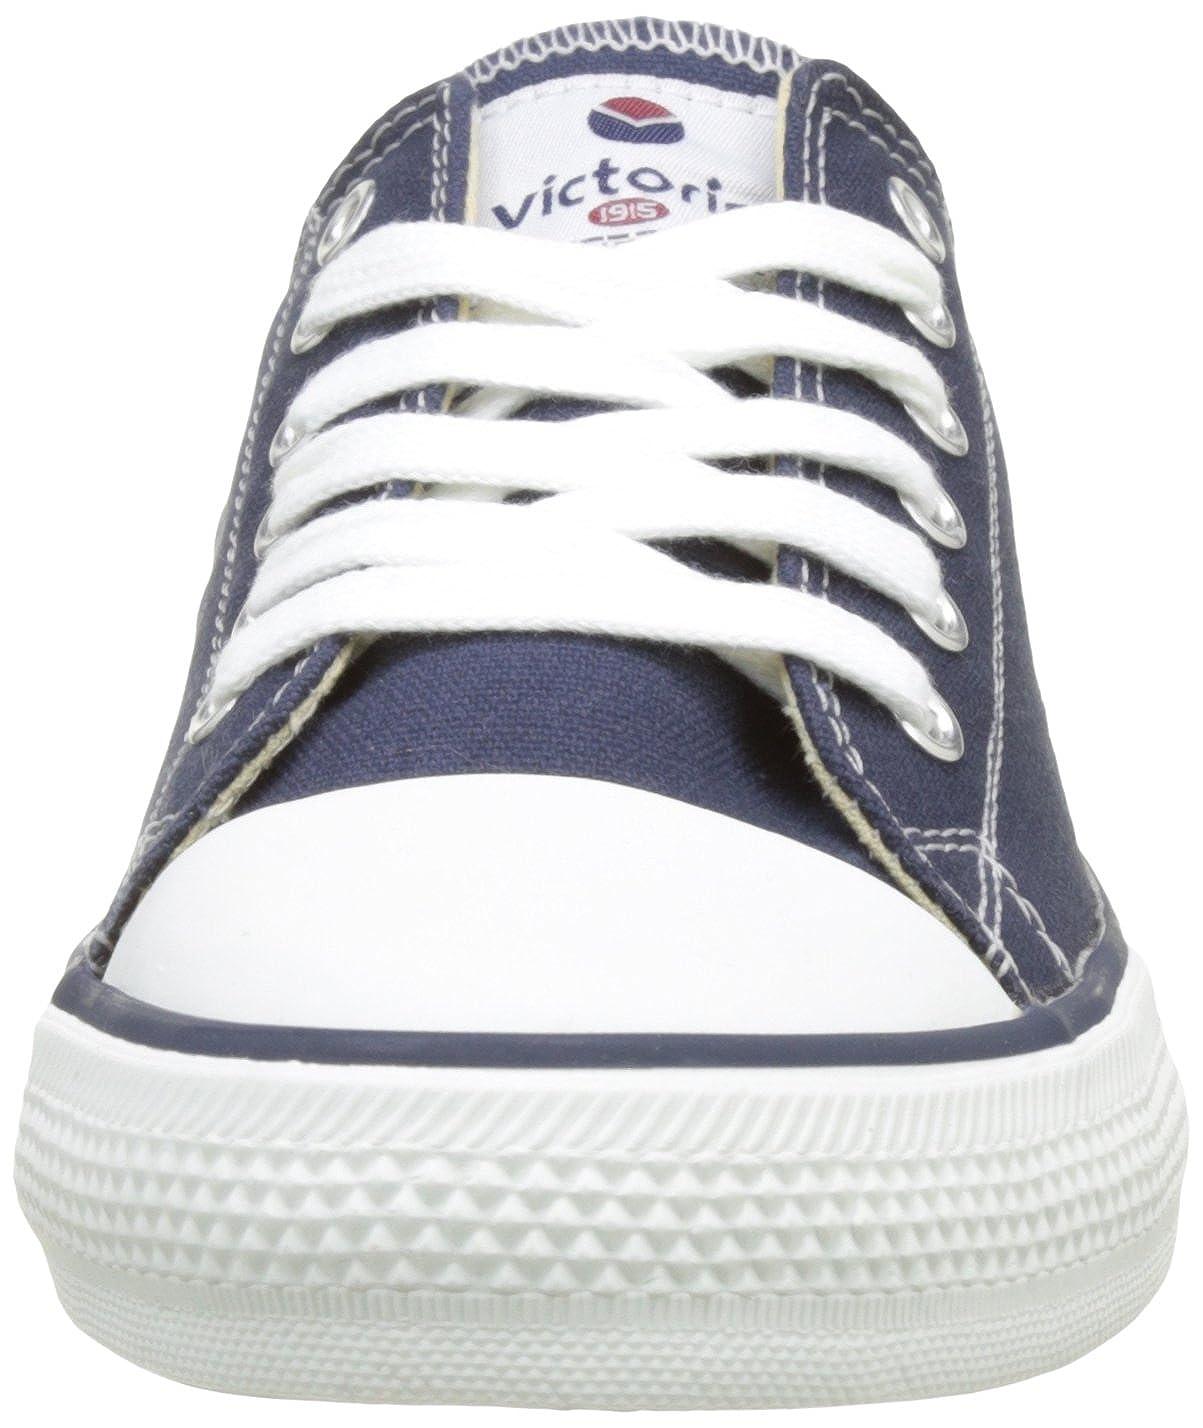 10.5 UK victoria Unisex Adults Zapato Basket Autoclave Hi-Top Trainers Blue Marino 30